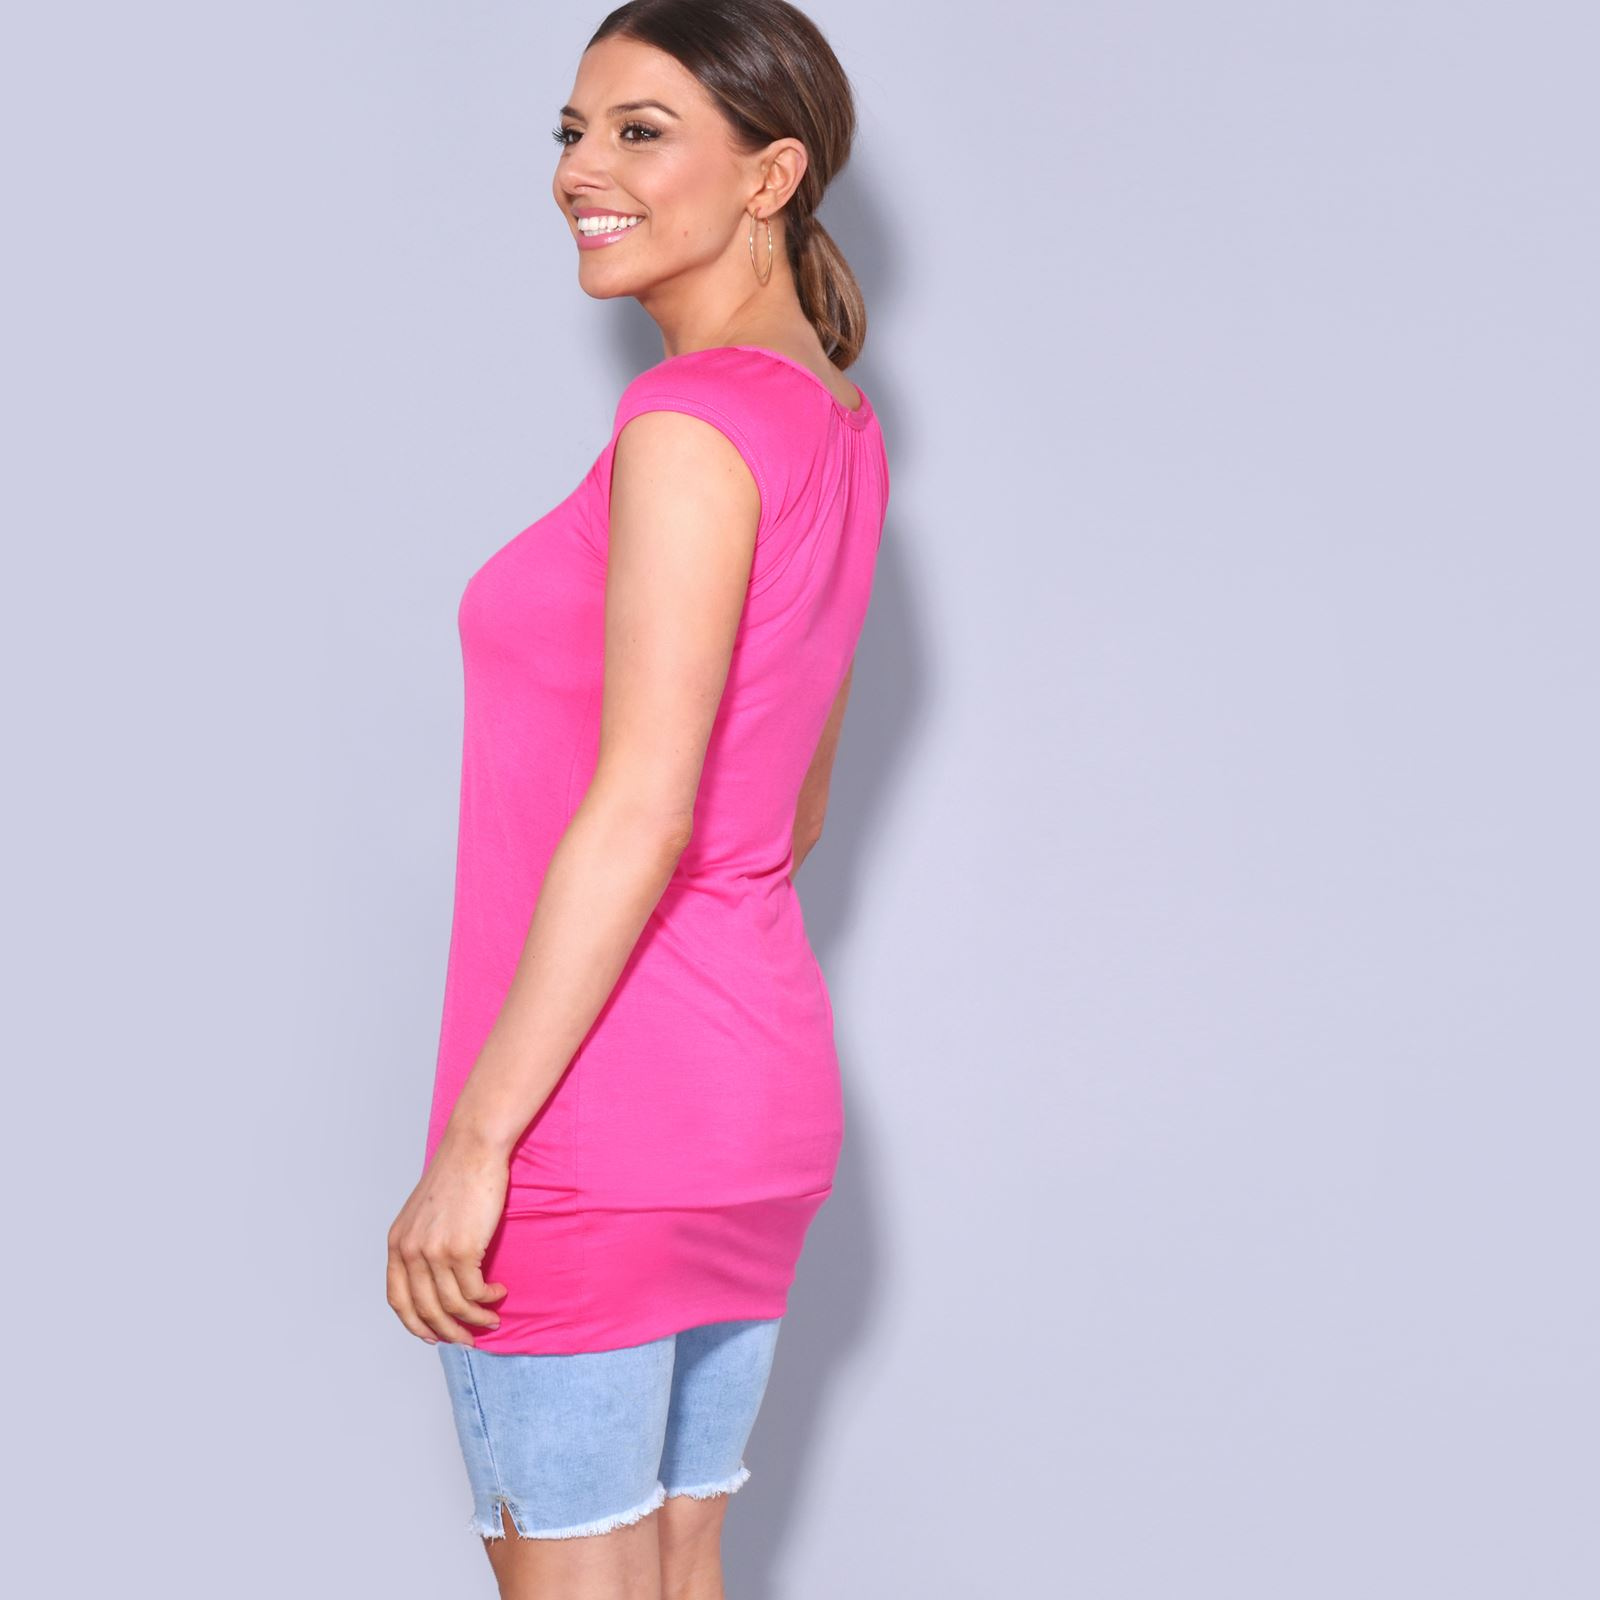 Womens-Ladies-Plain-T-Shirt-Short-Sleeve-Long-Loose-V-Neck-Blouse-Tunic-Top thumbnail 10